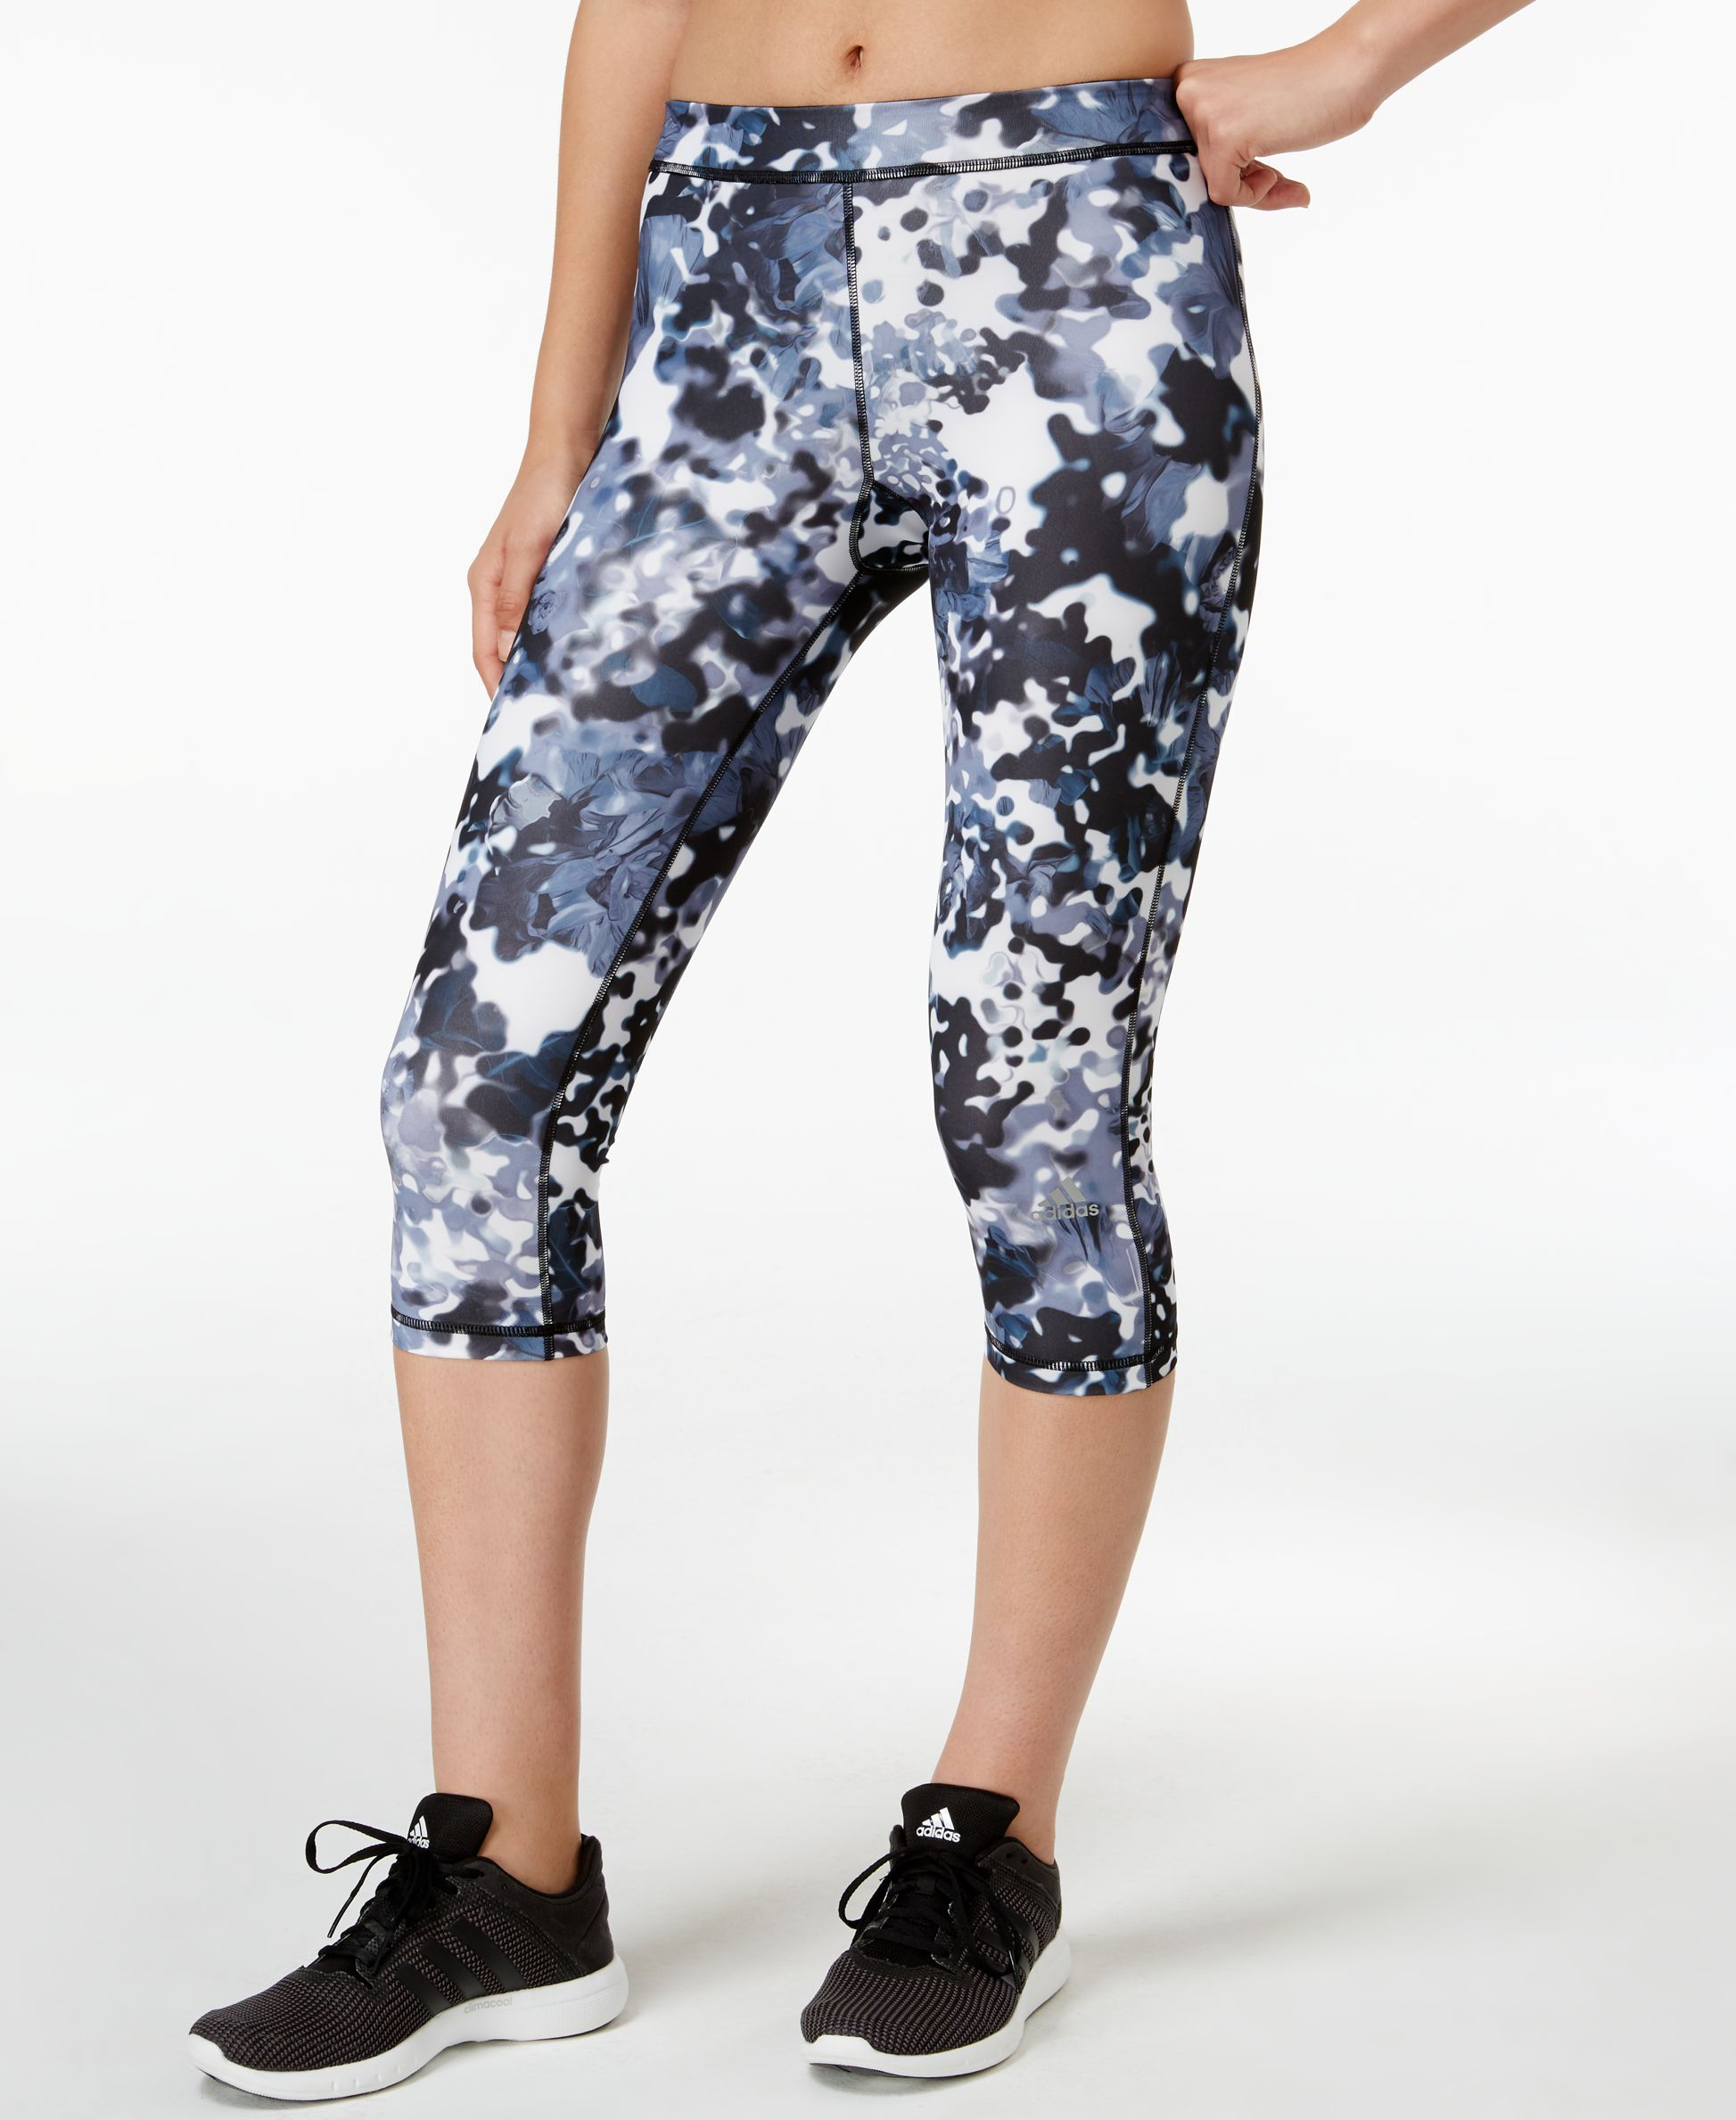 8fbf6eed9d6b adidas TechFit Floral-Print Capri Leggings